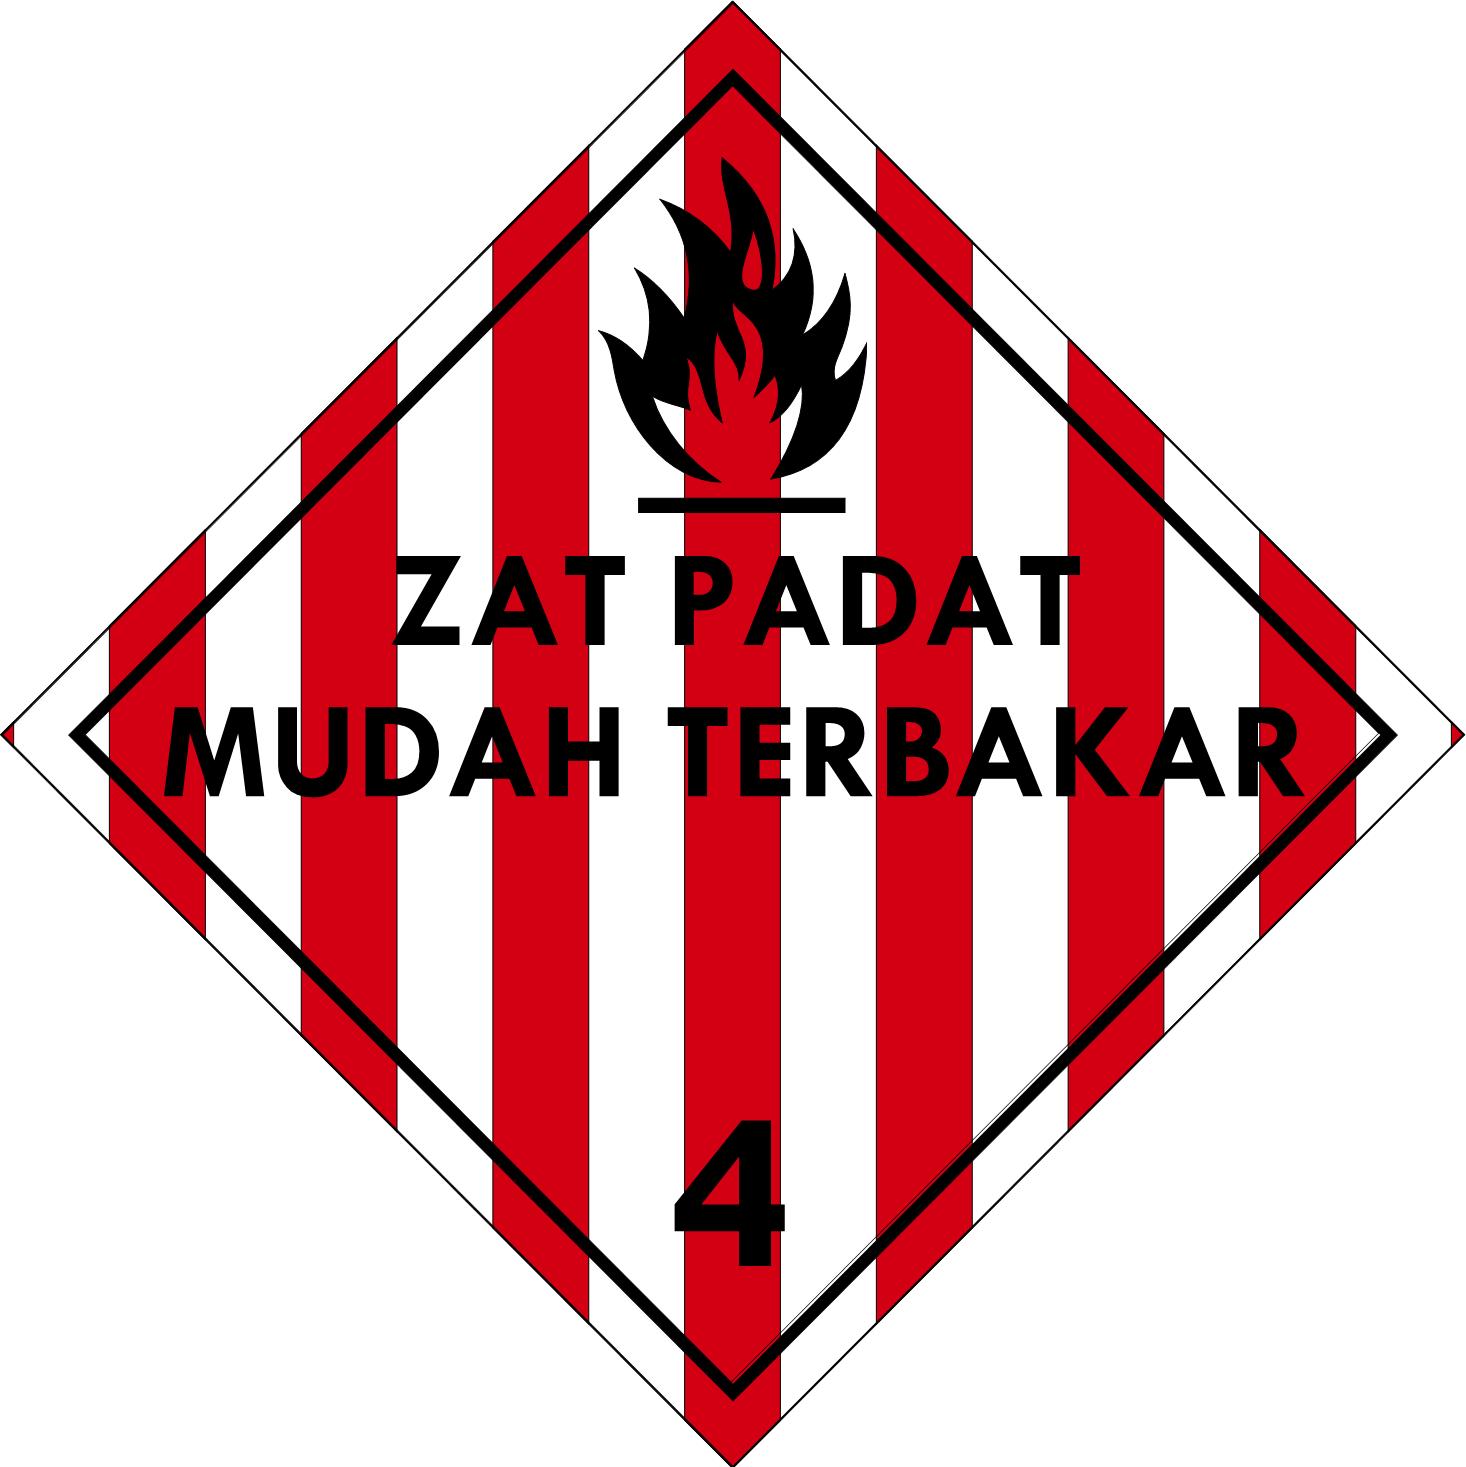 Label (Simbol) Transportasi Bahan (Material) Zat Padat Mudah Terbakar 4.1